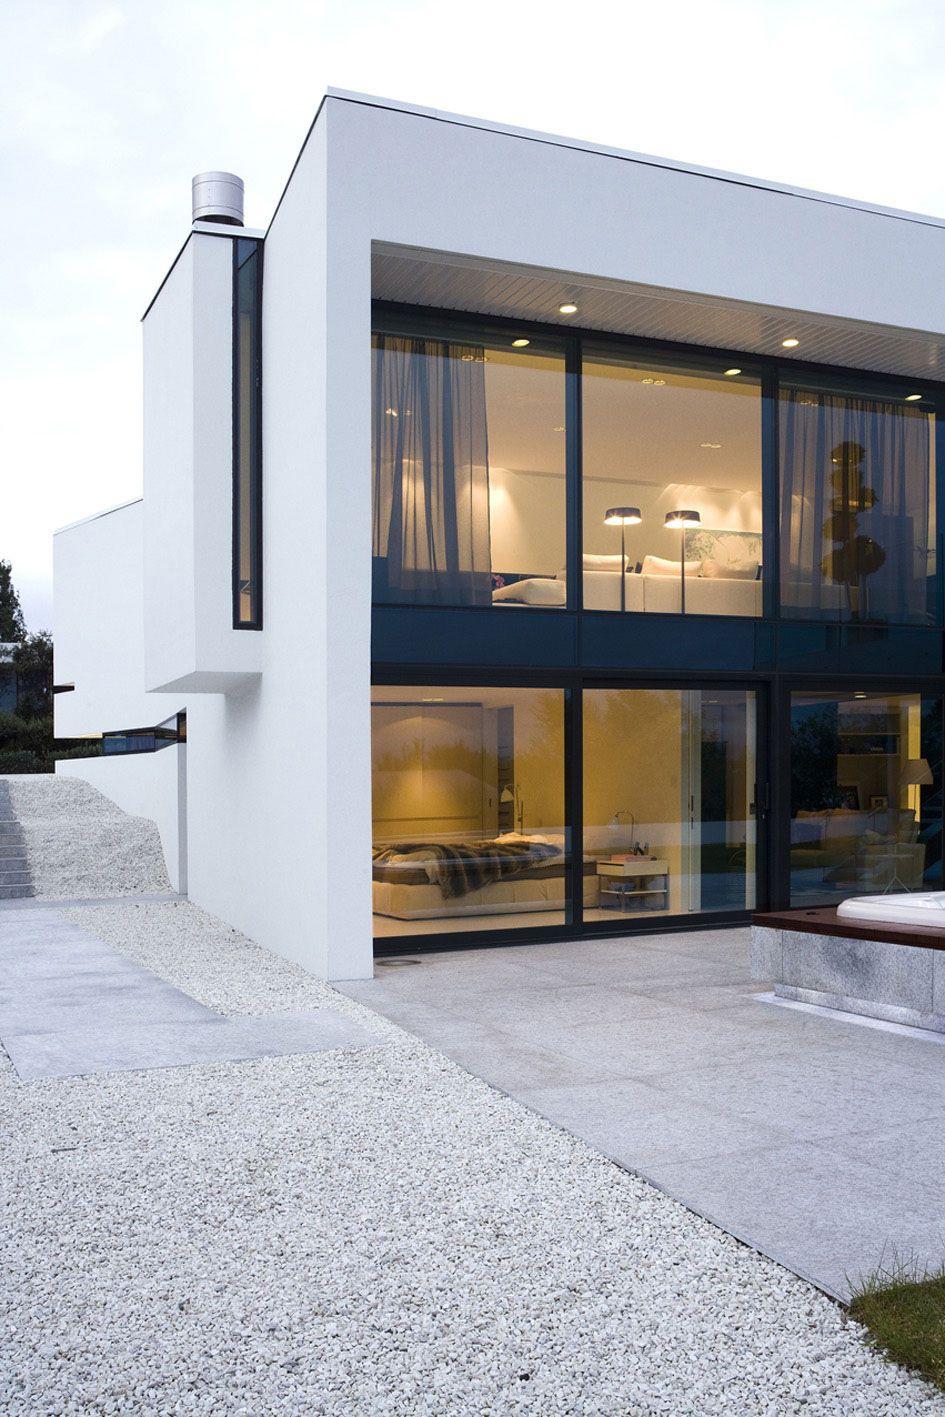 B25 House by PK Arkitektar / Reykjavik, Iceland